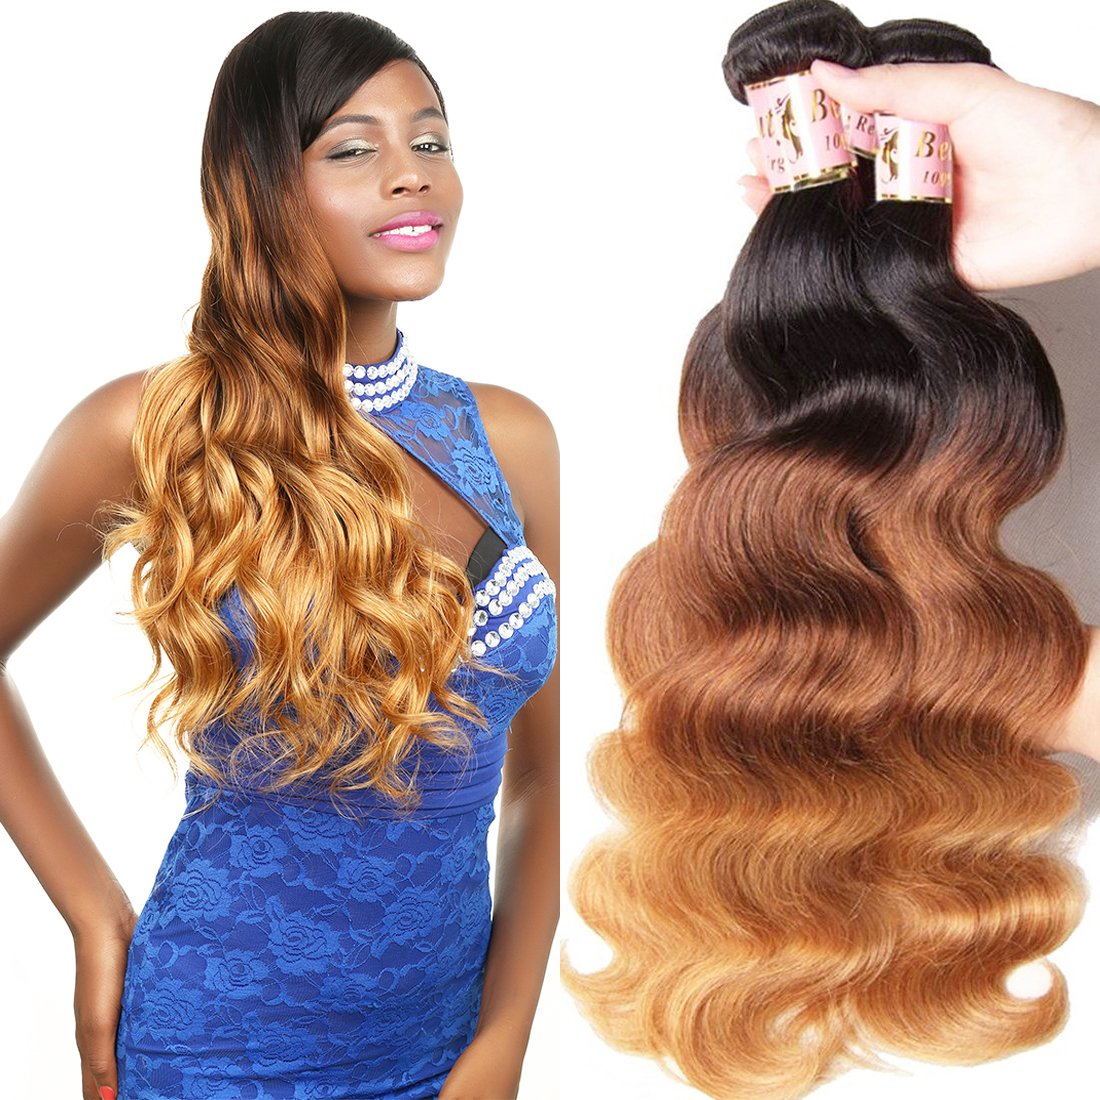 Amazon Beauty Forever Hair Peruvian Ombre Virgin Hair 16 18 20